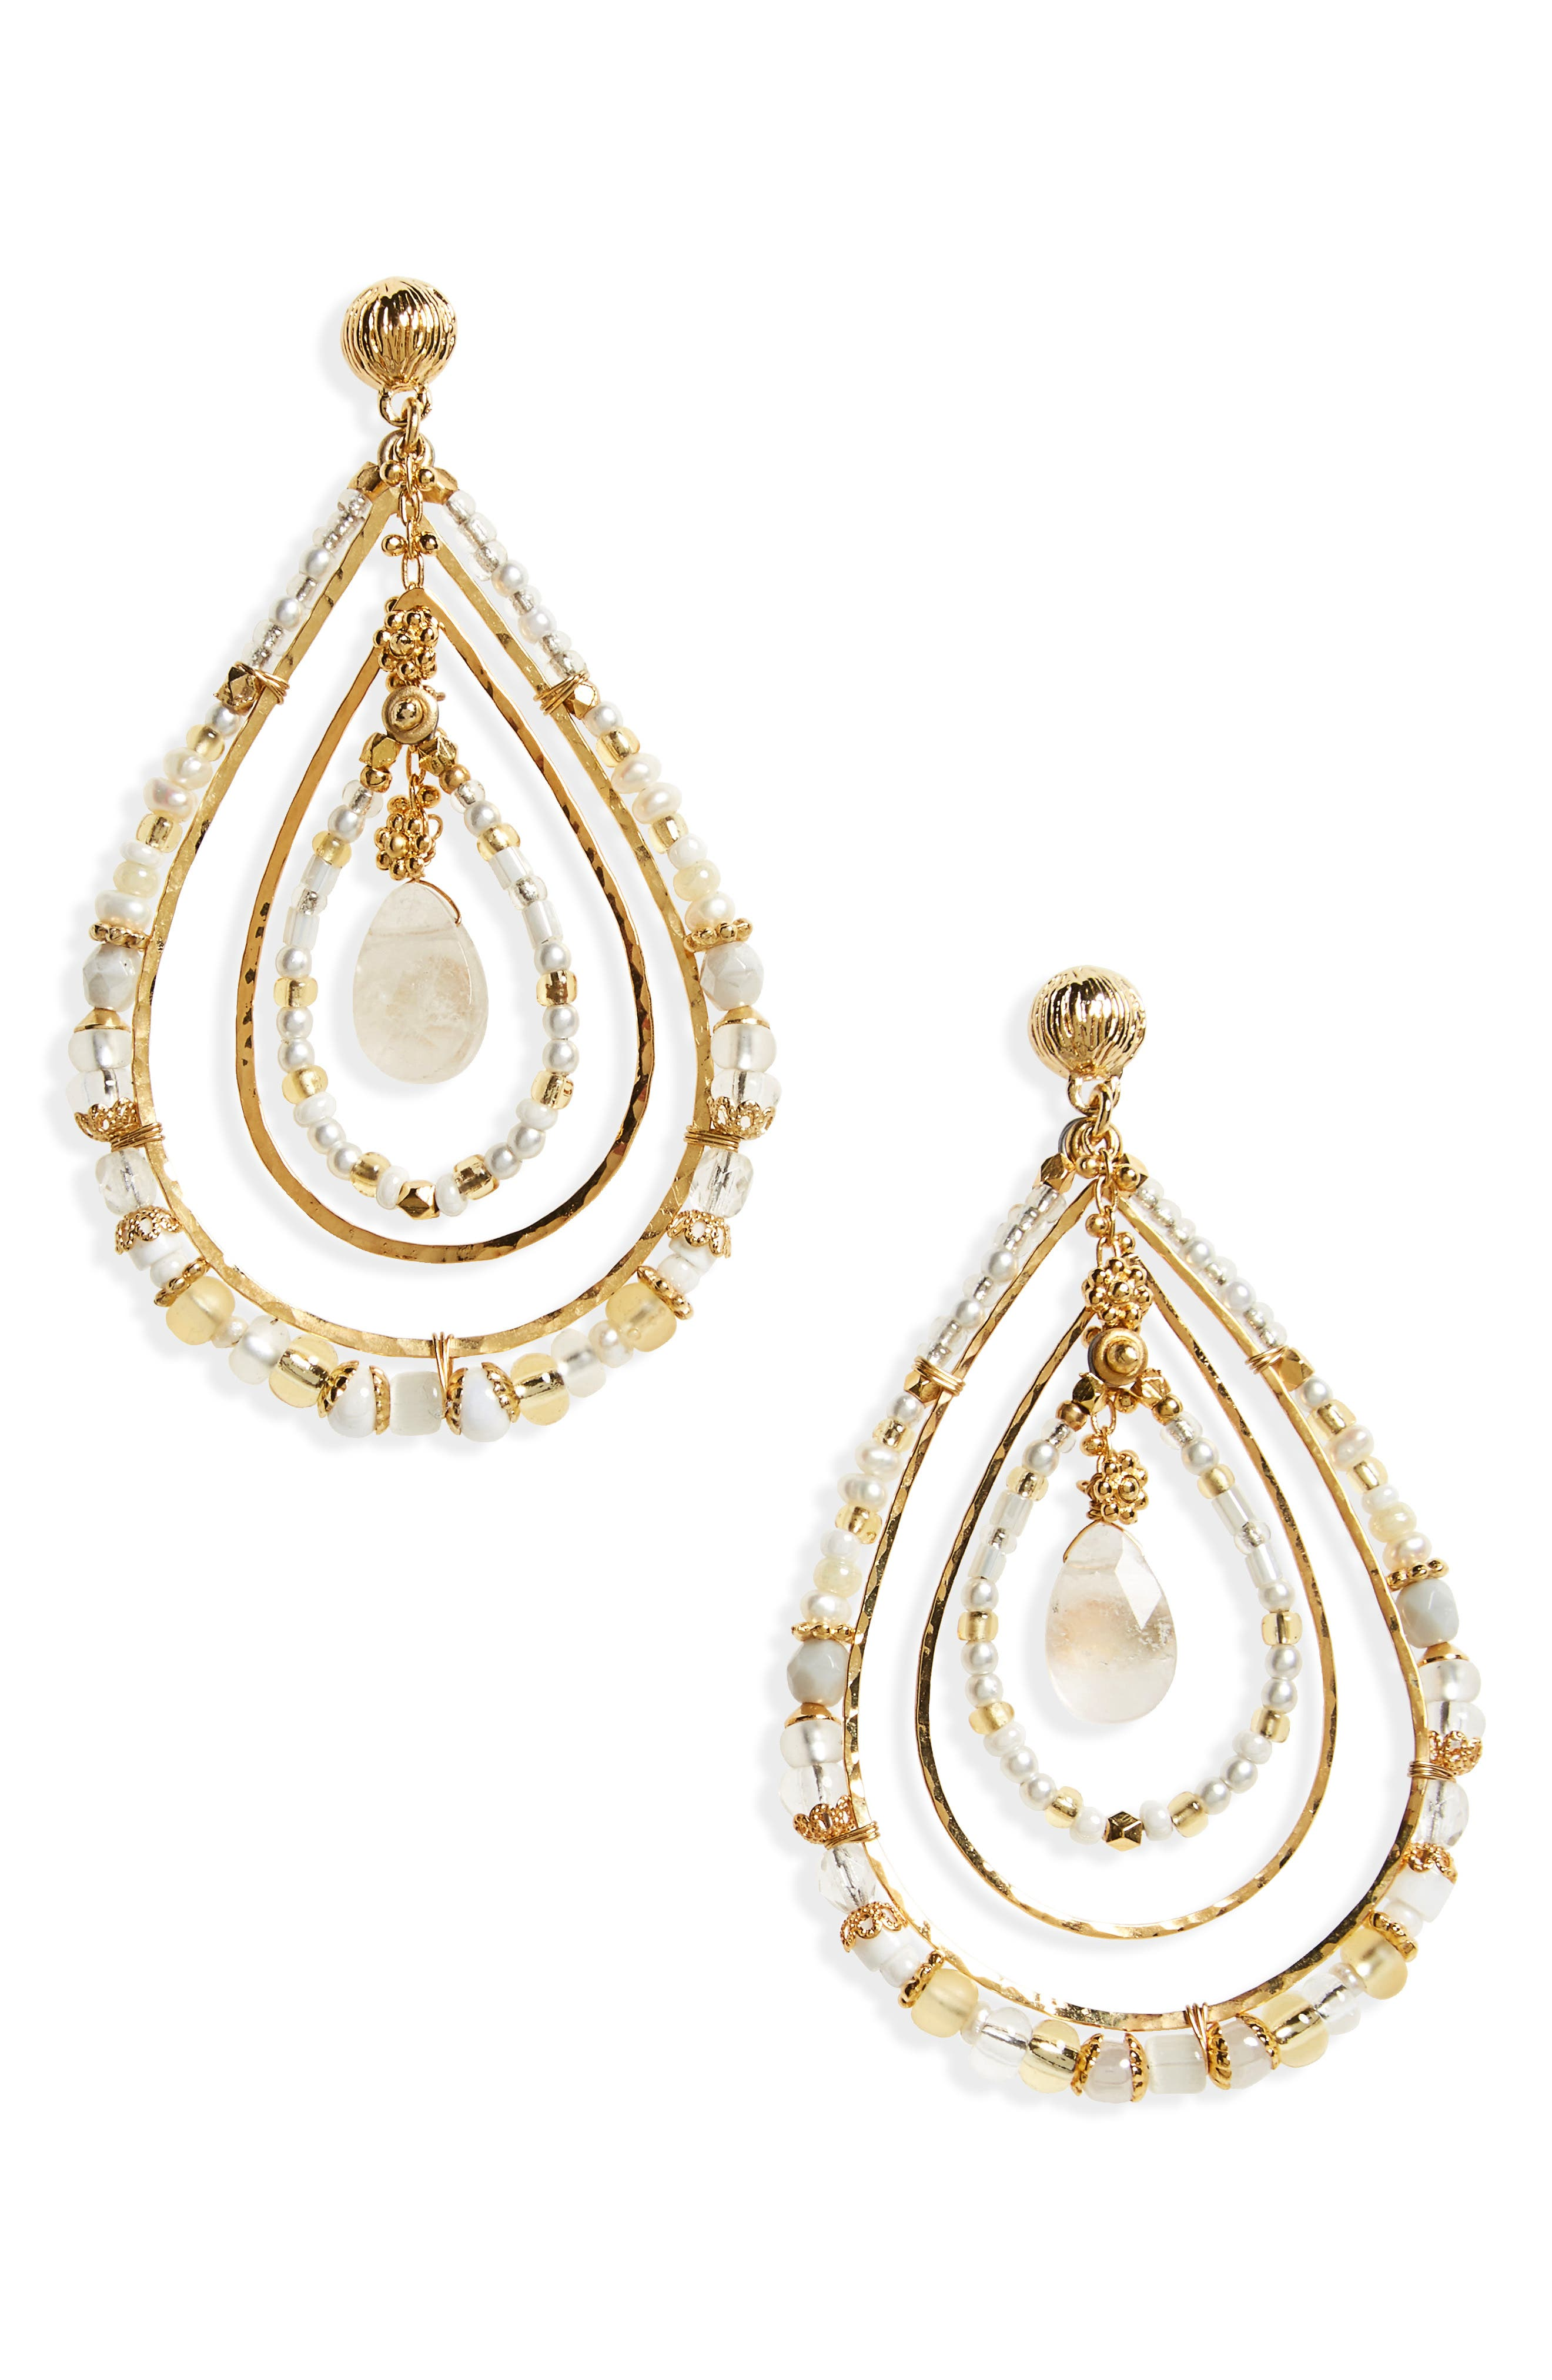 Alternate Image 1 Selected - Gas Bijoux Aurore Beaded Teardrop Earrings